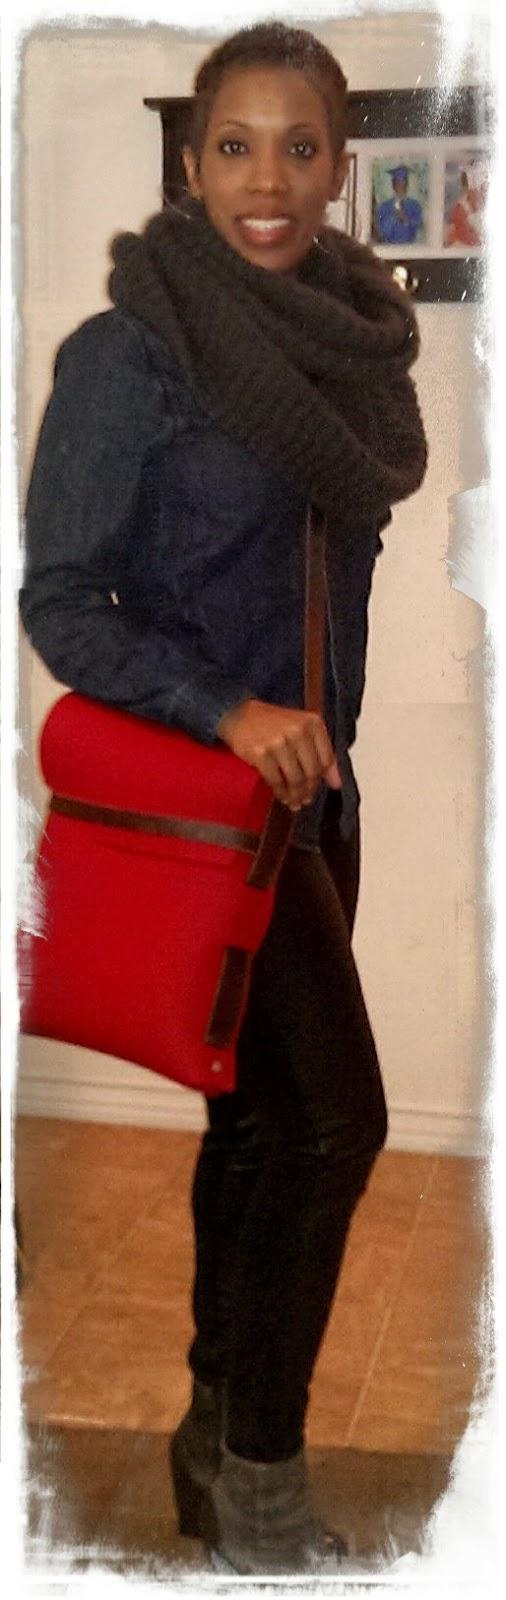 Rustico+Foodie+Set Rustico Review-Rustico Leather